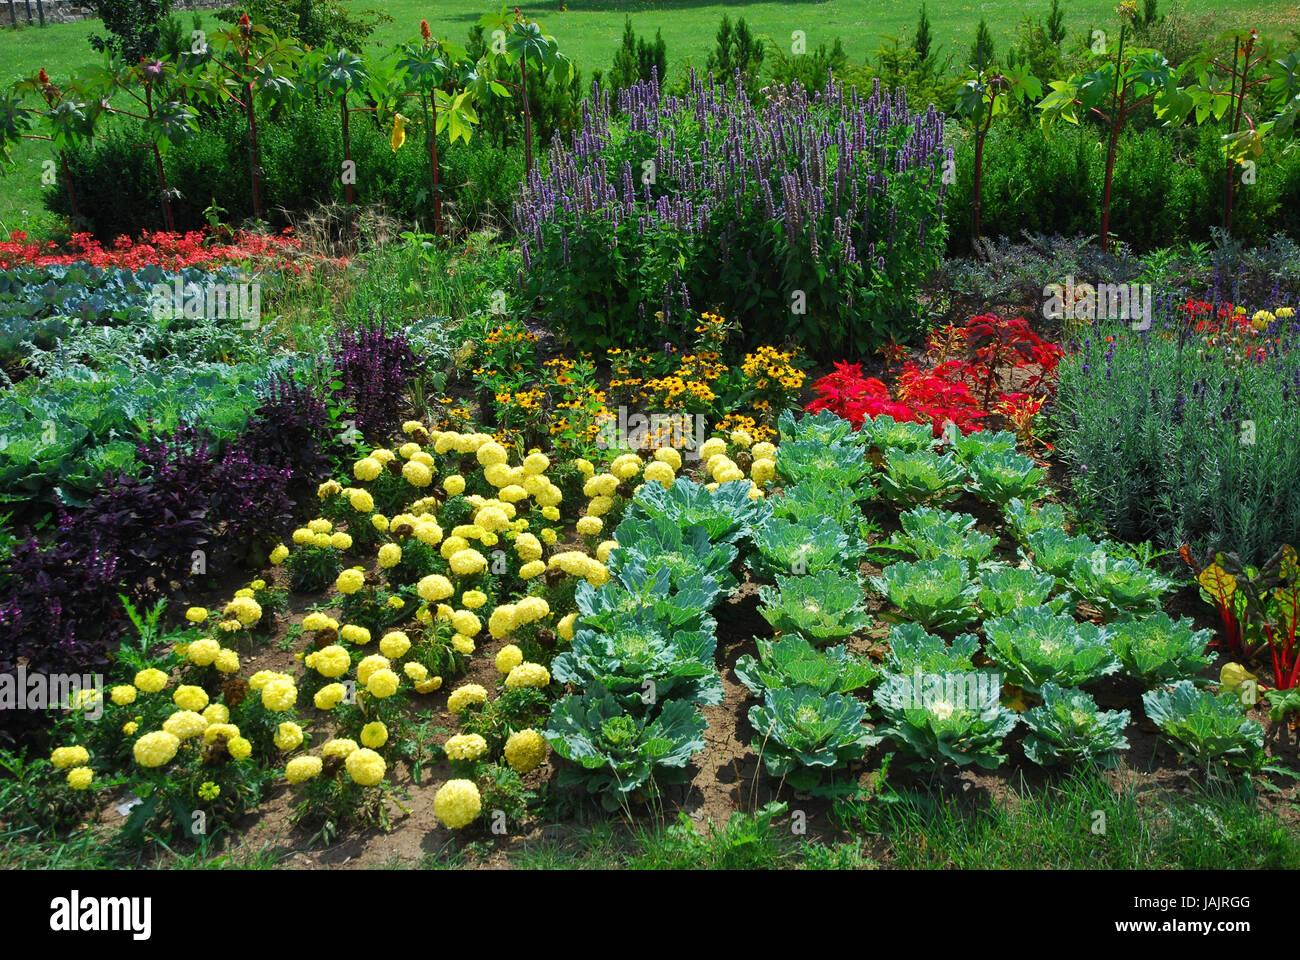 Biogarden Stock Photos Biogarden Stock Images Alamy